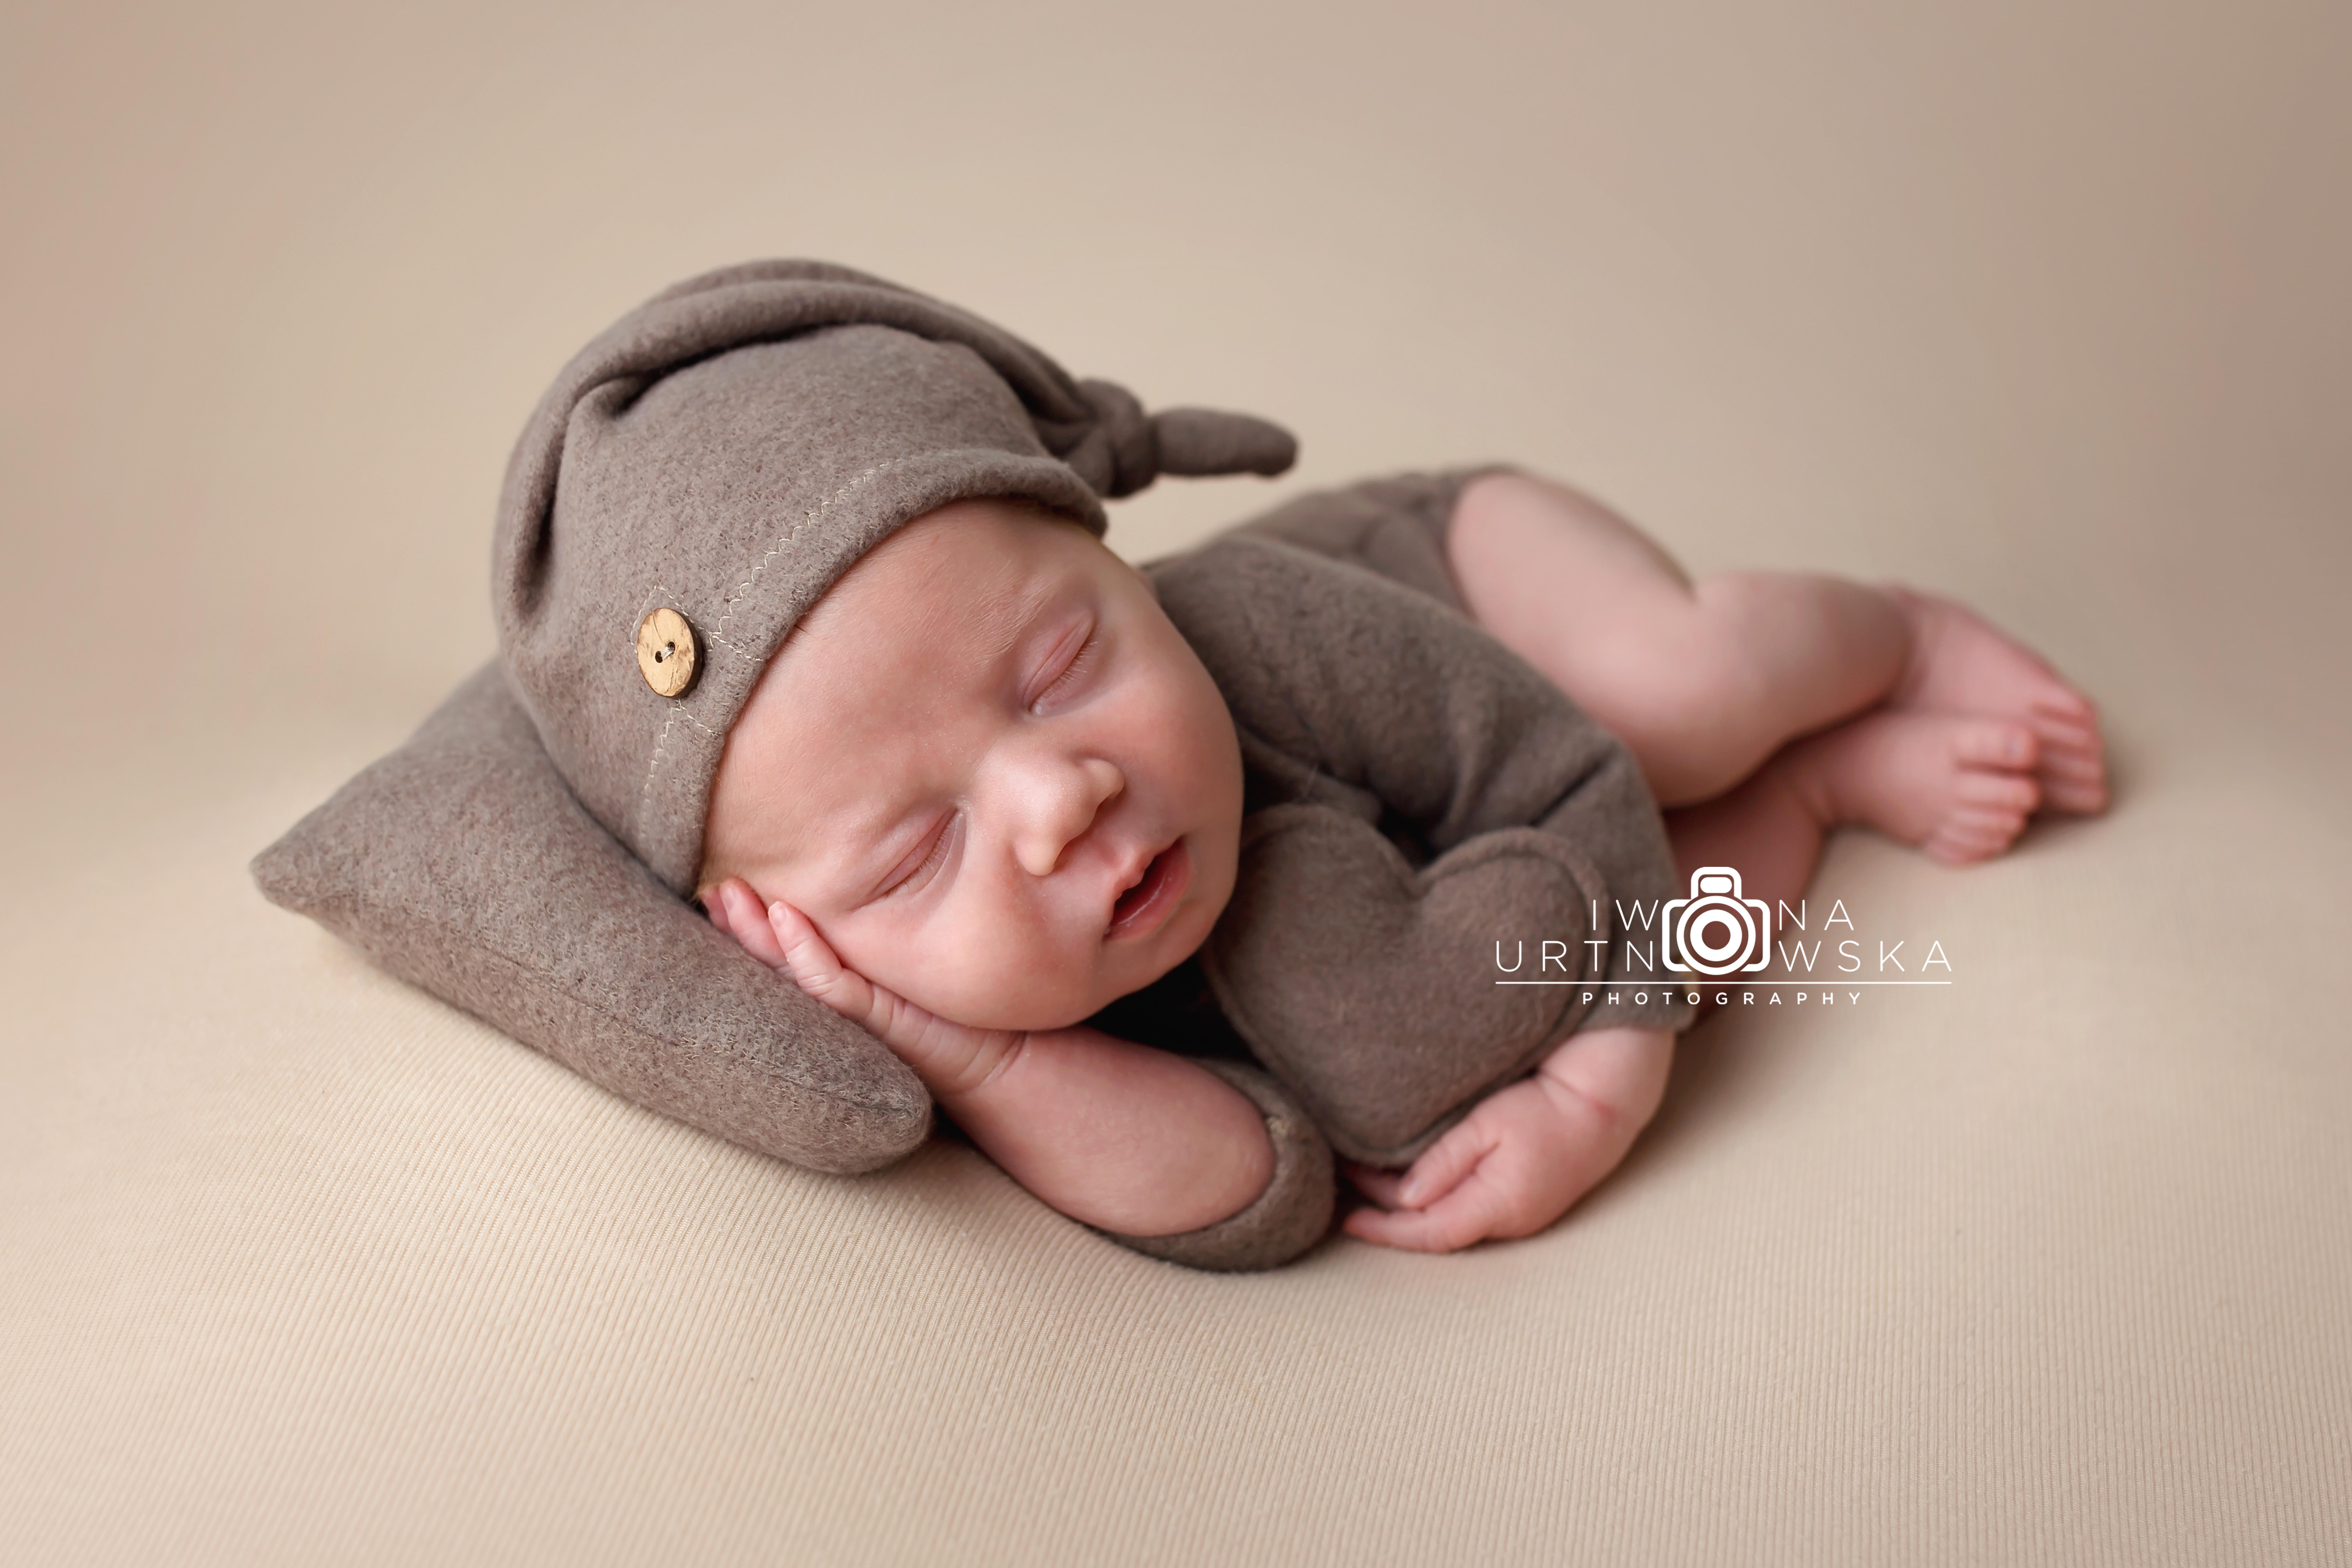 Baby photographer Shropshire